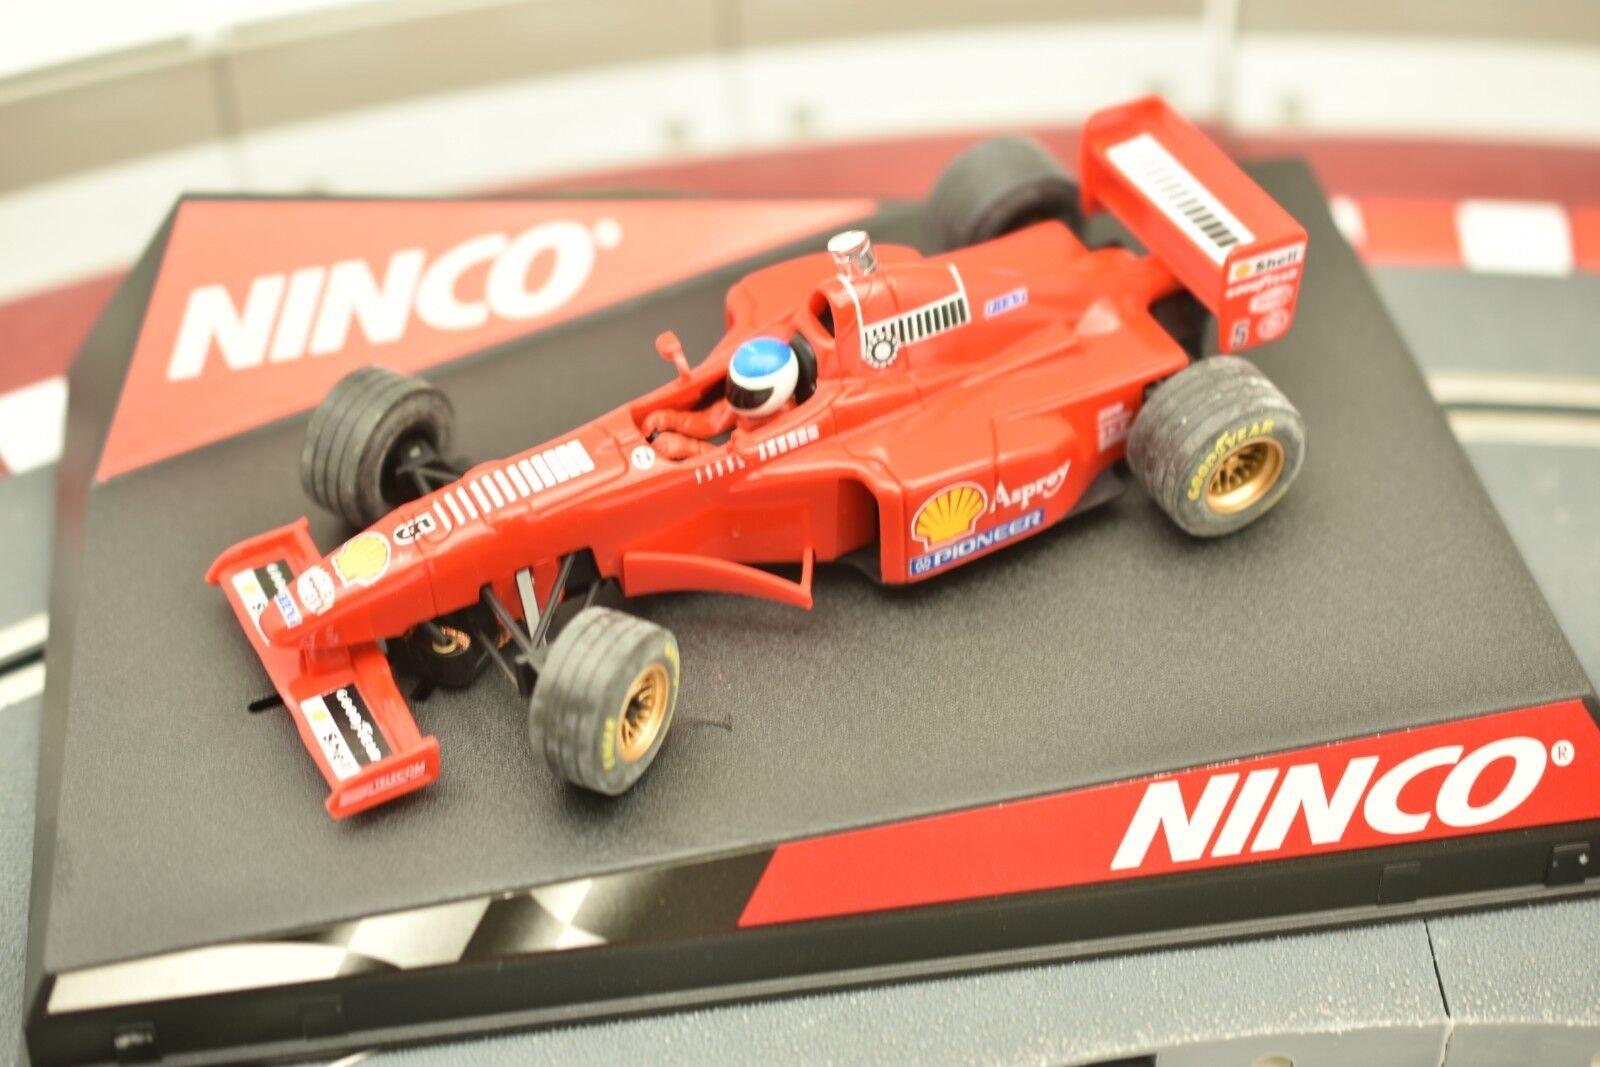 50162 NINCO 1 32 SLOT CAR F-1 F310 B N 5 RED FERRARI